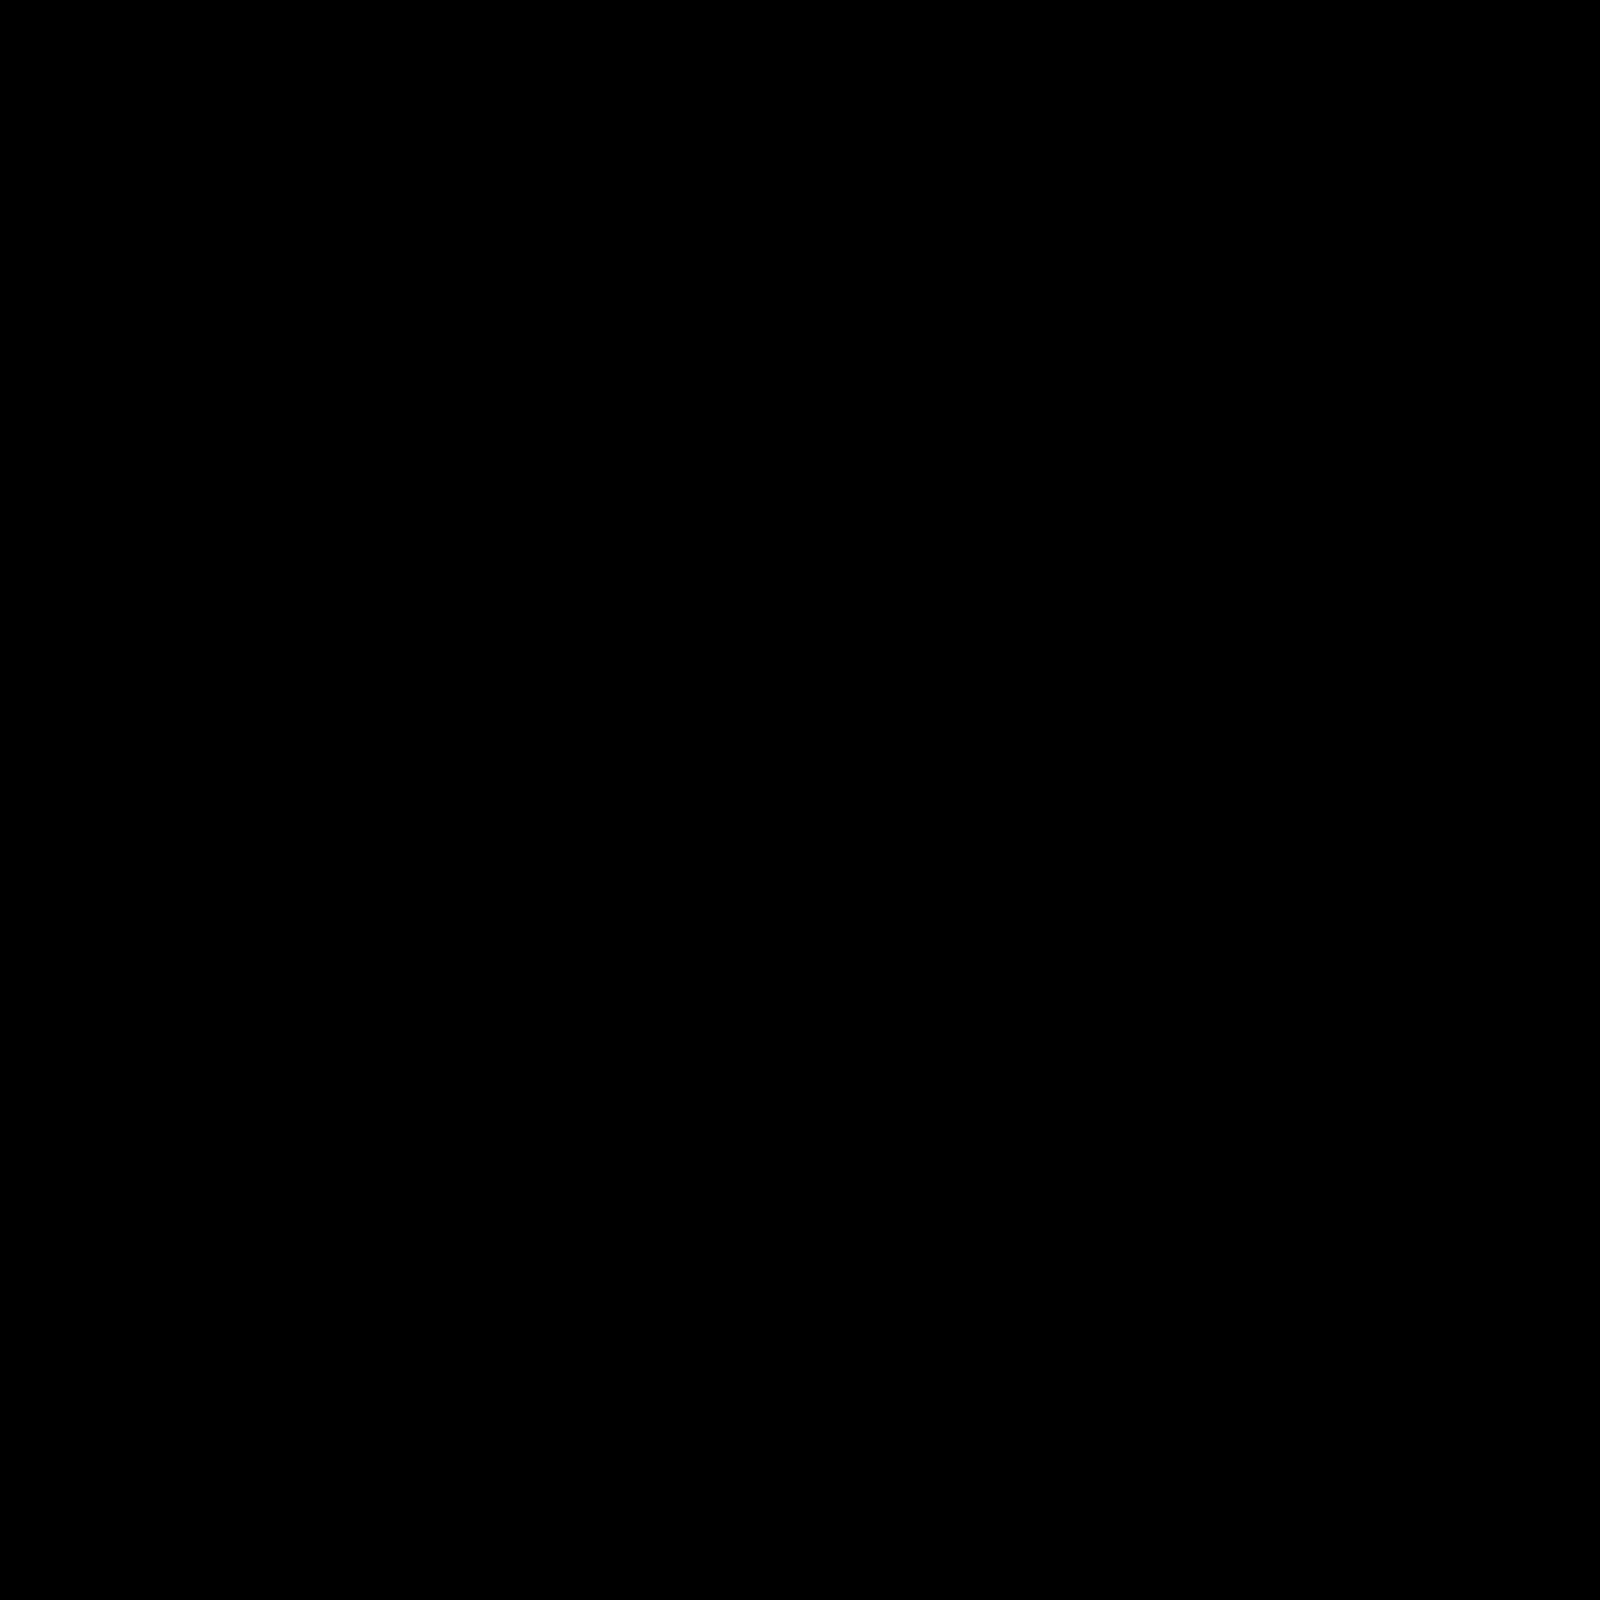 Stacking icon